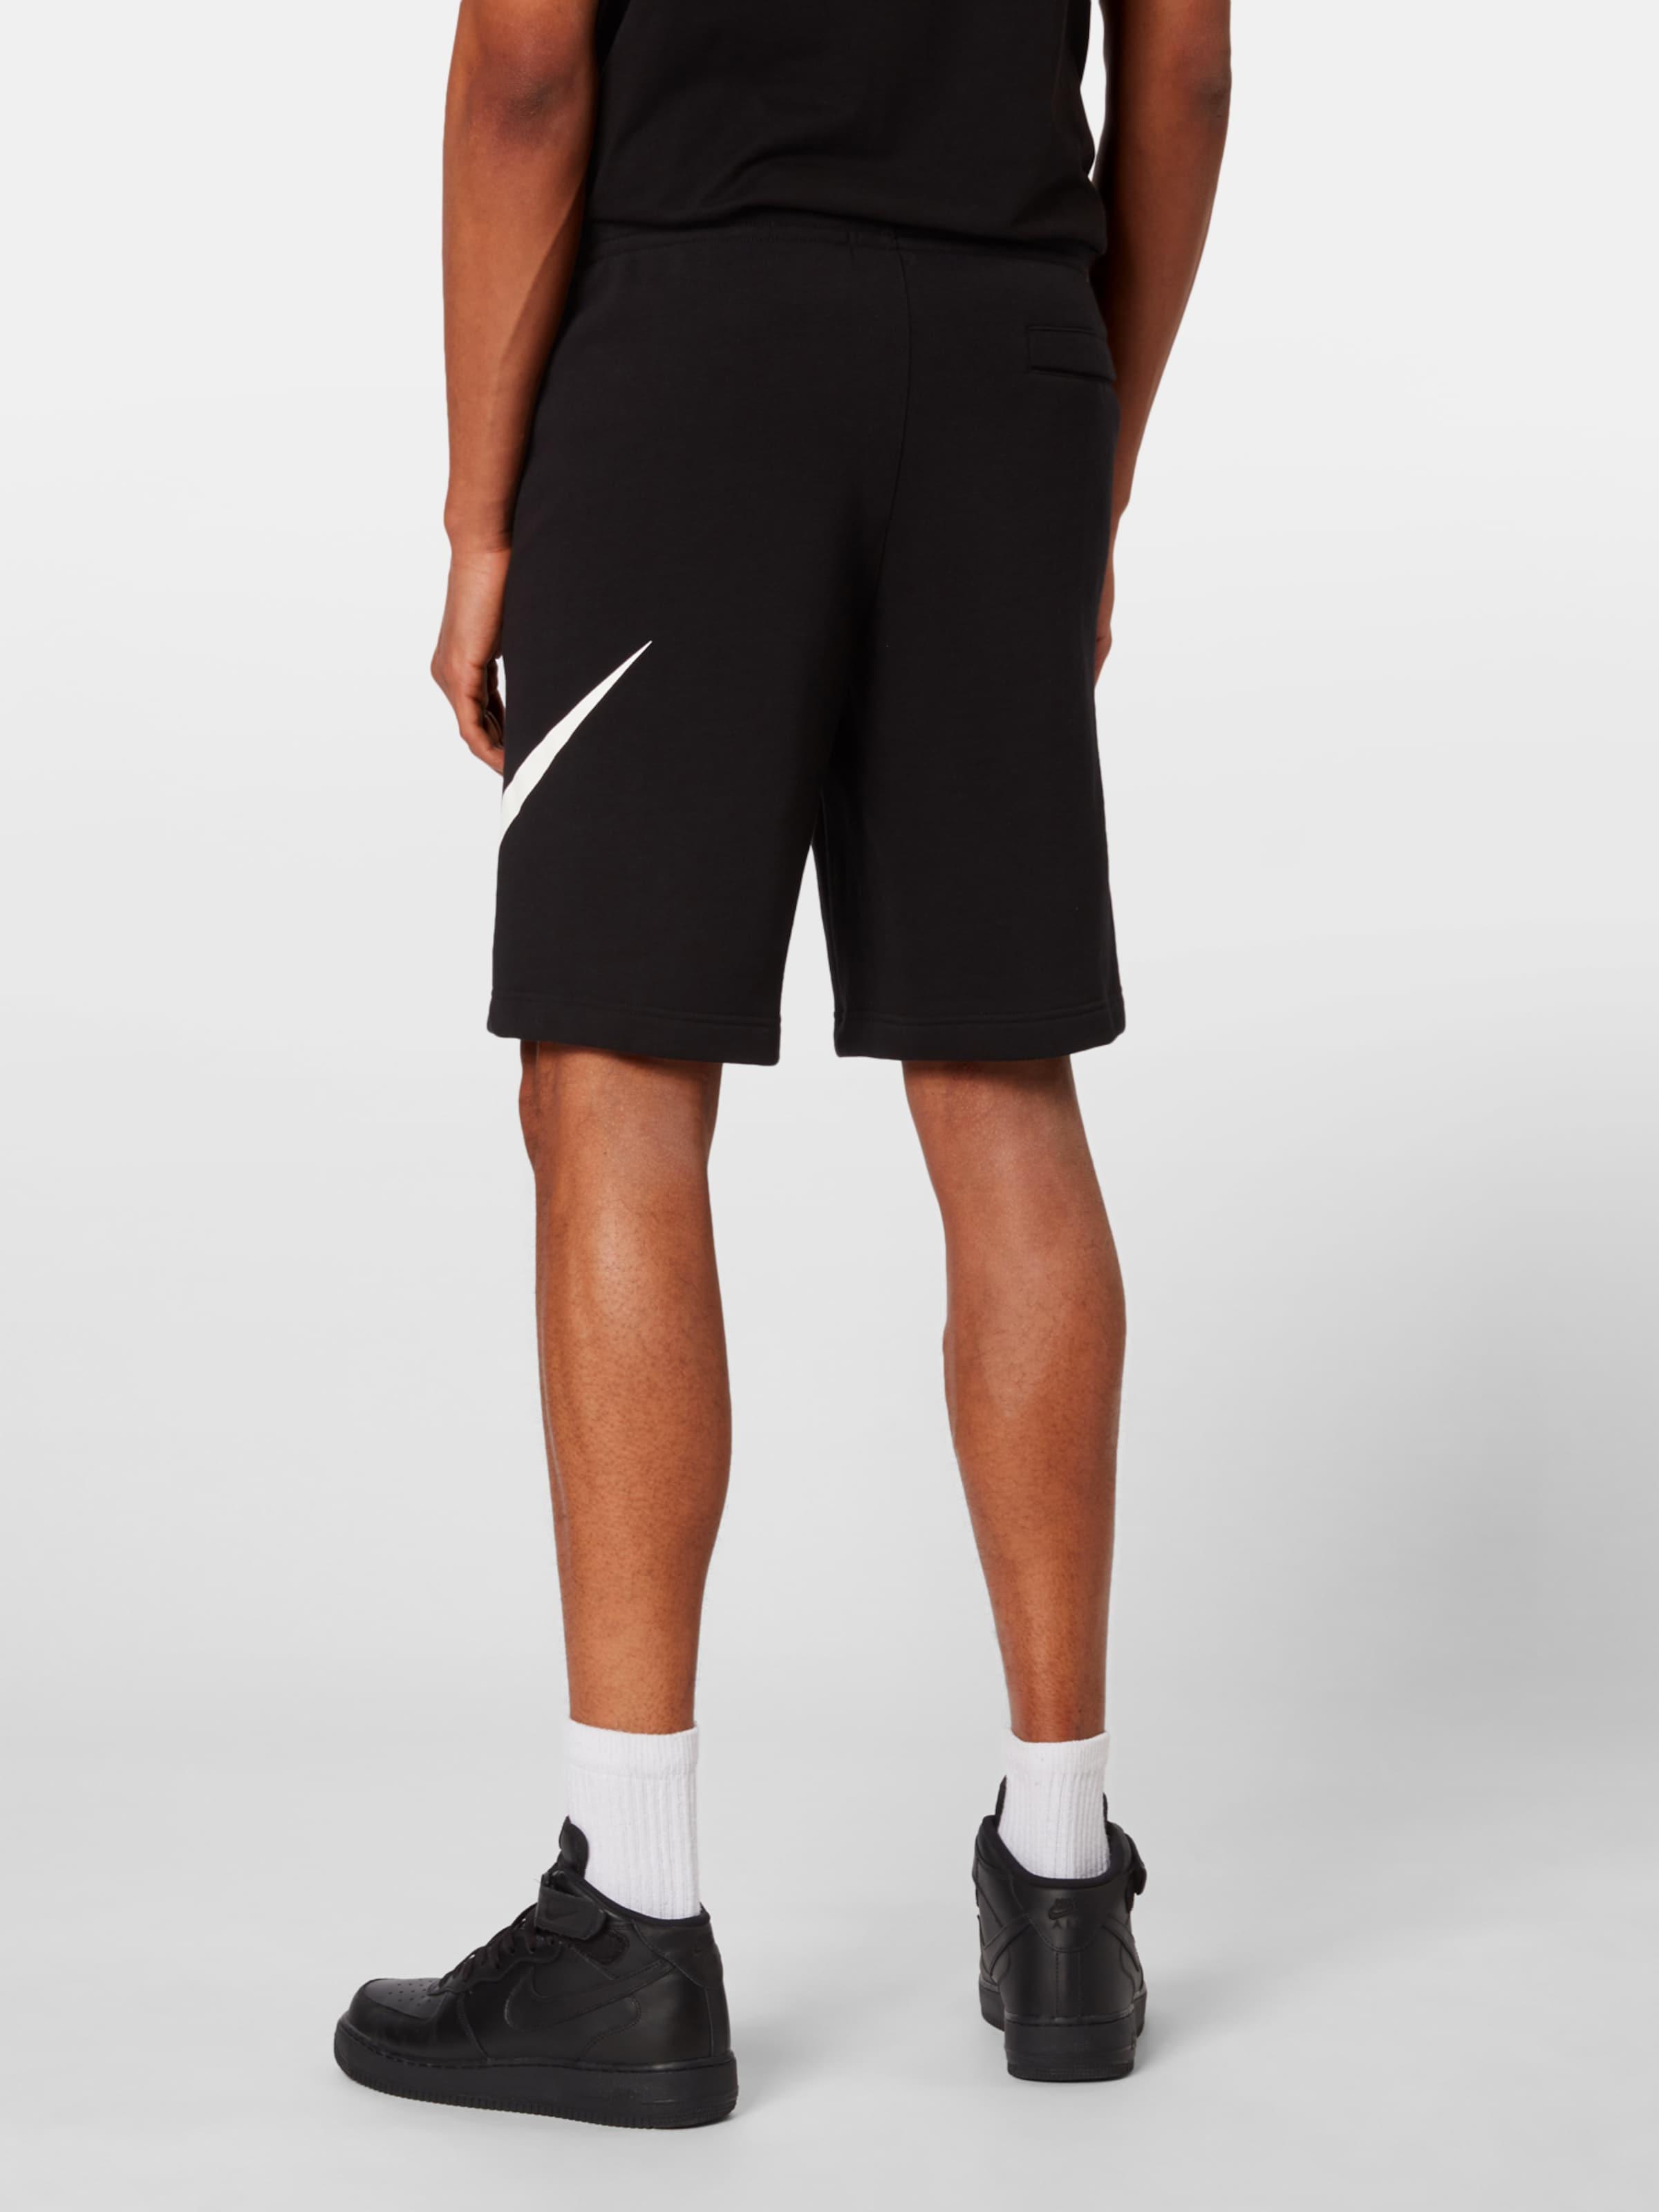 Shorts Sportswear SchwarzWeiß Nike In IYeDWH29E